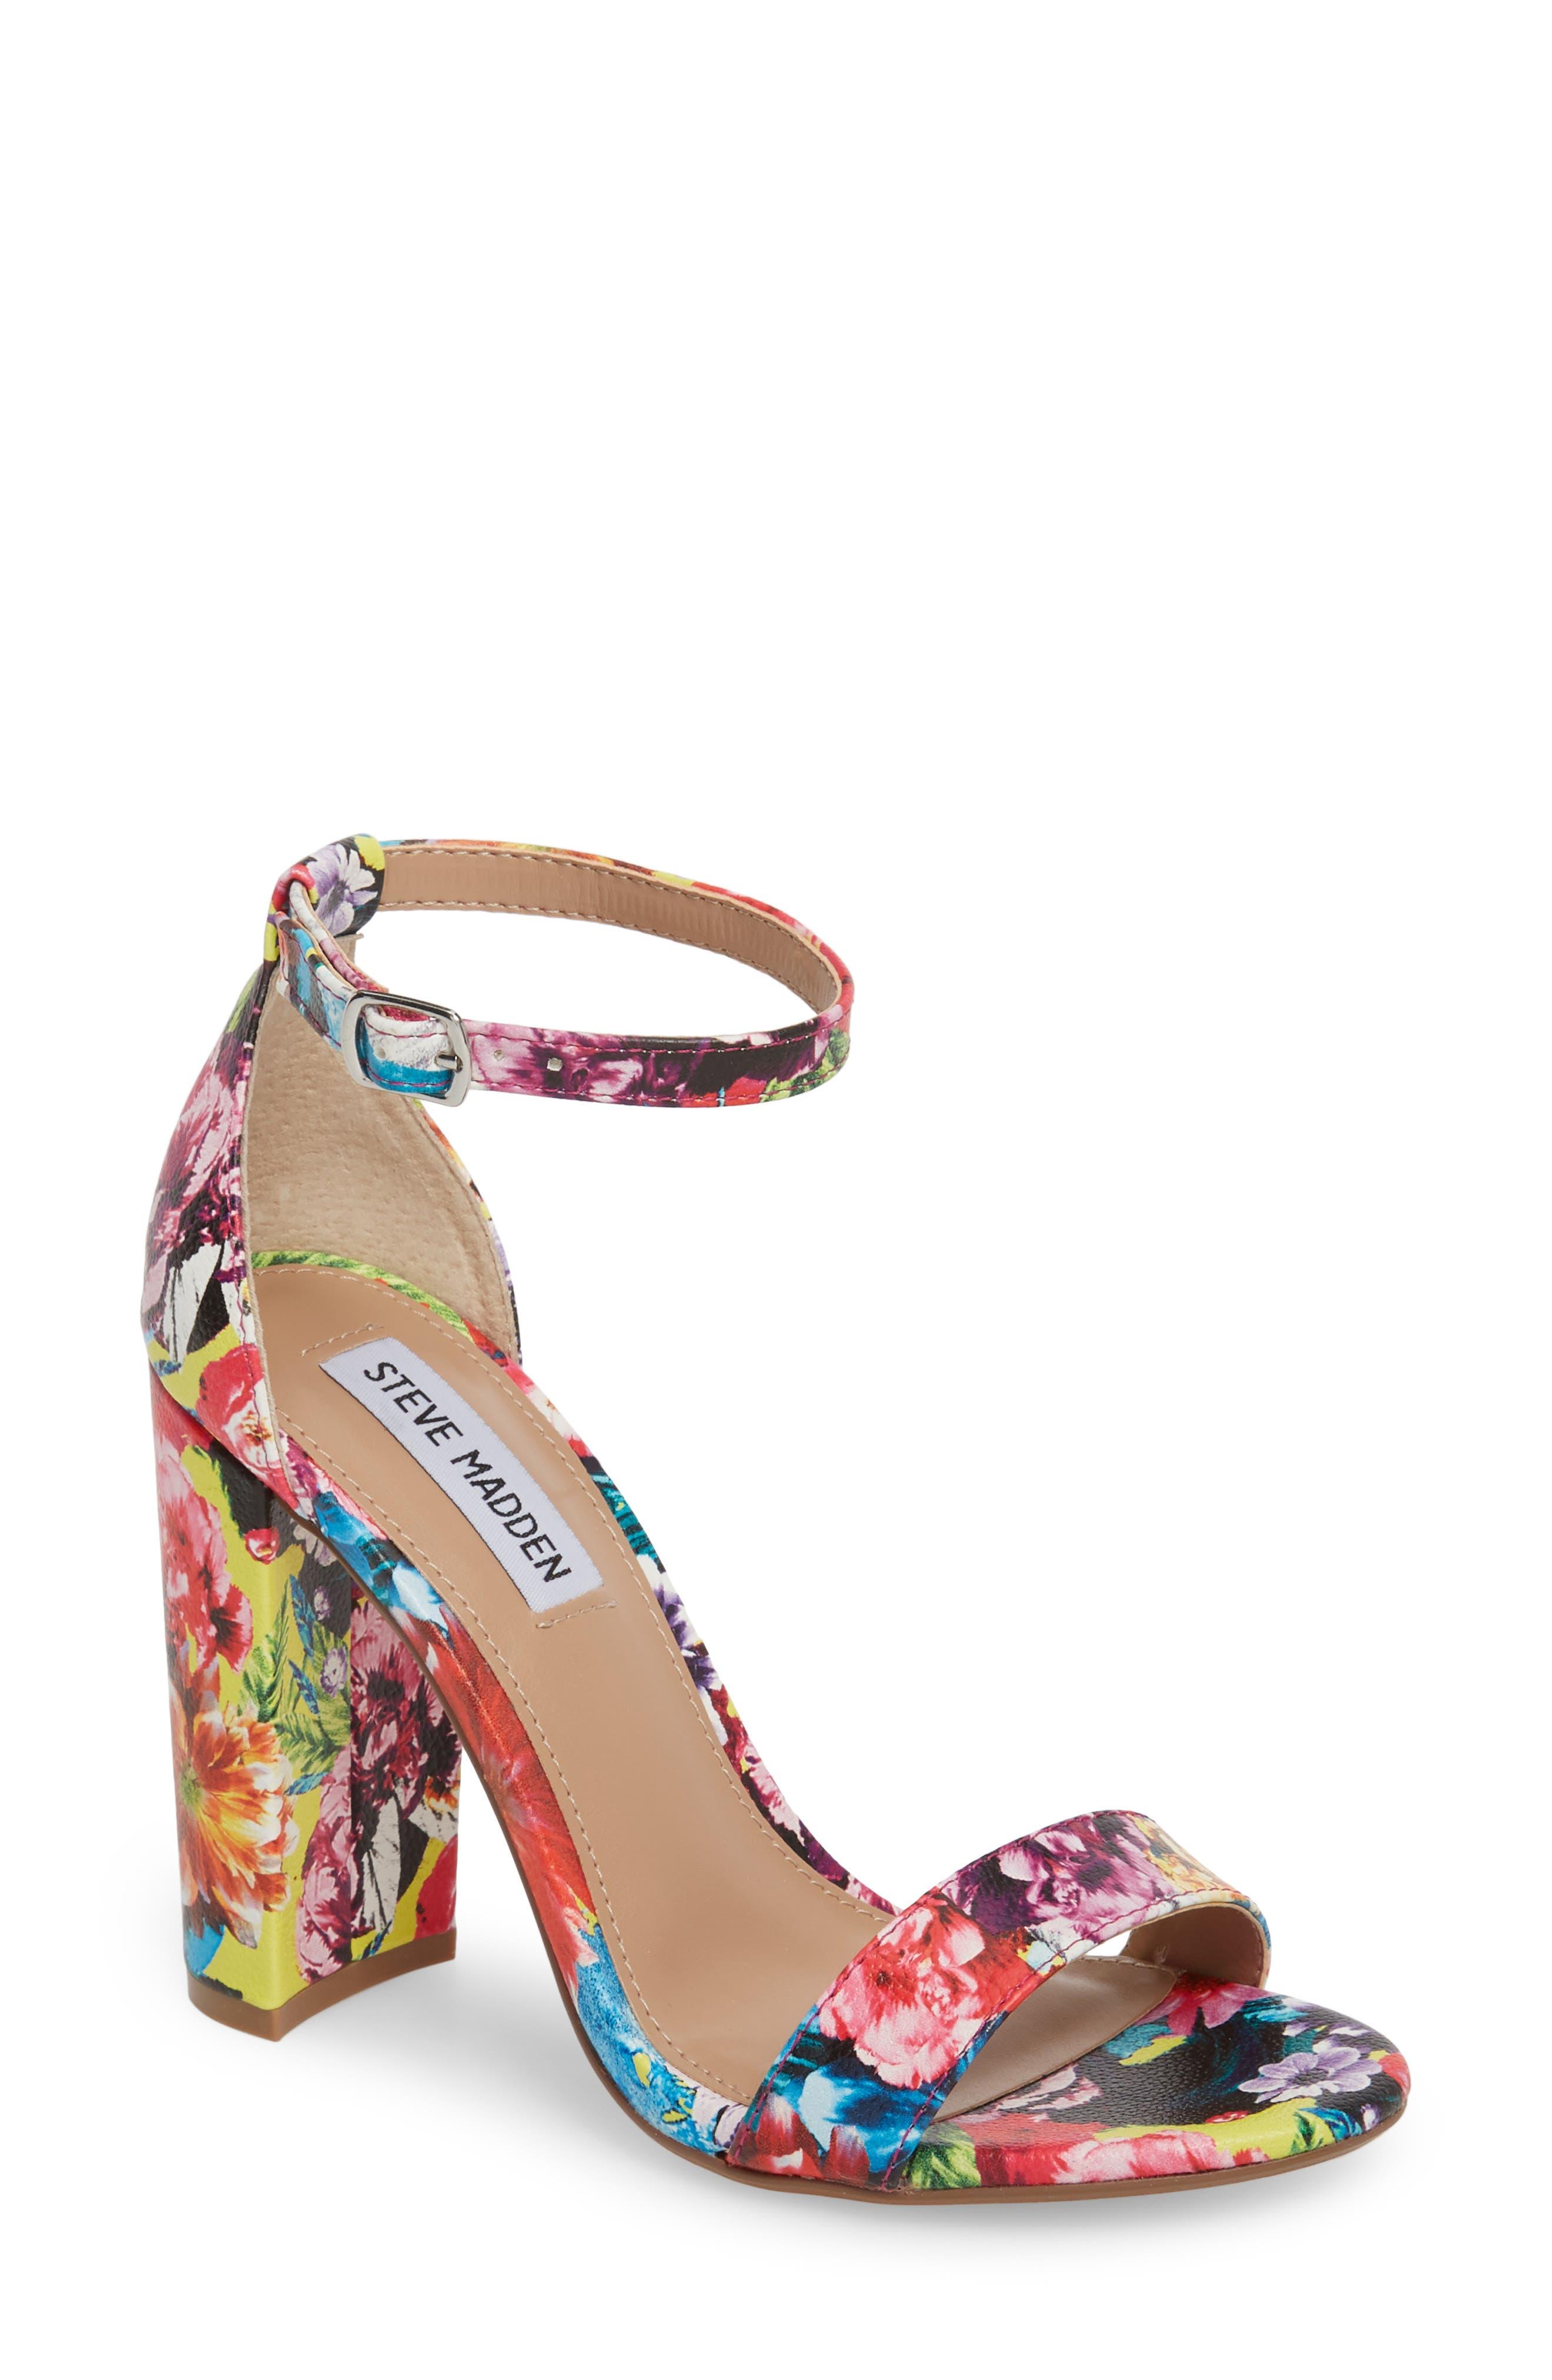 Carrson Sandal,                         Main,                         color, FLOWER MULTI